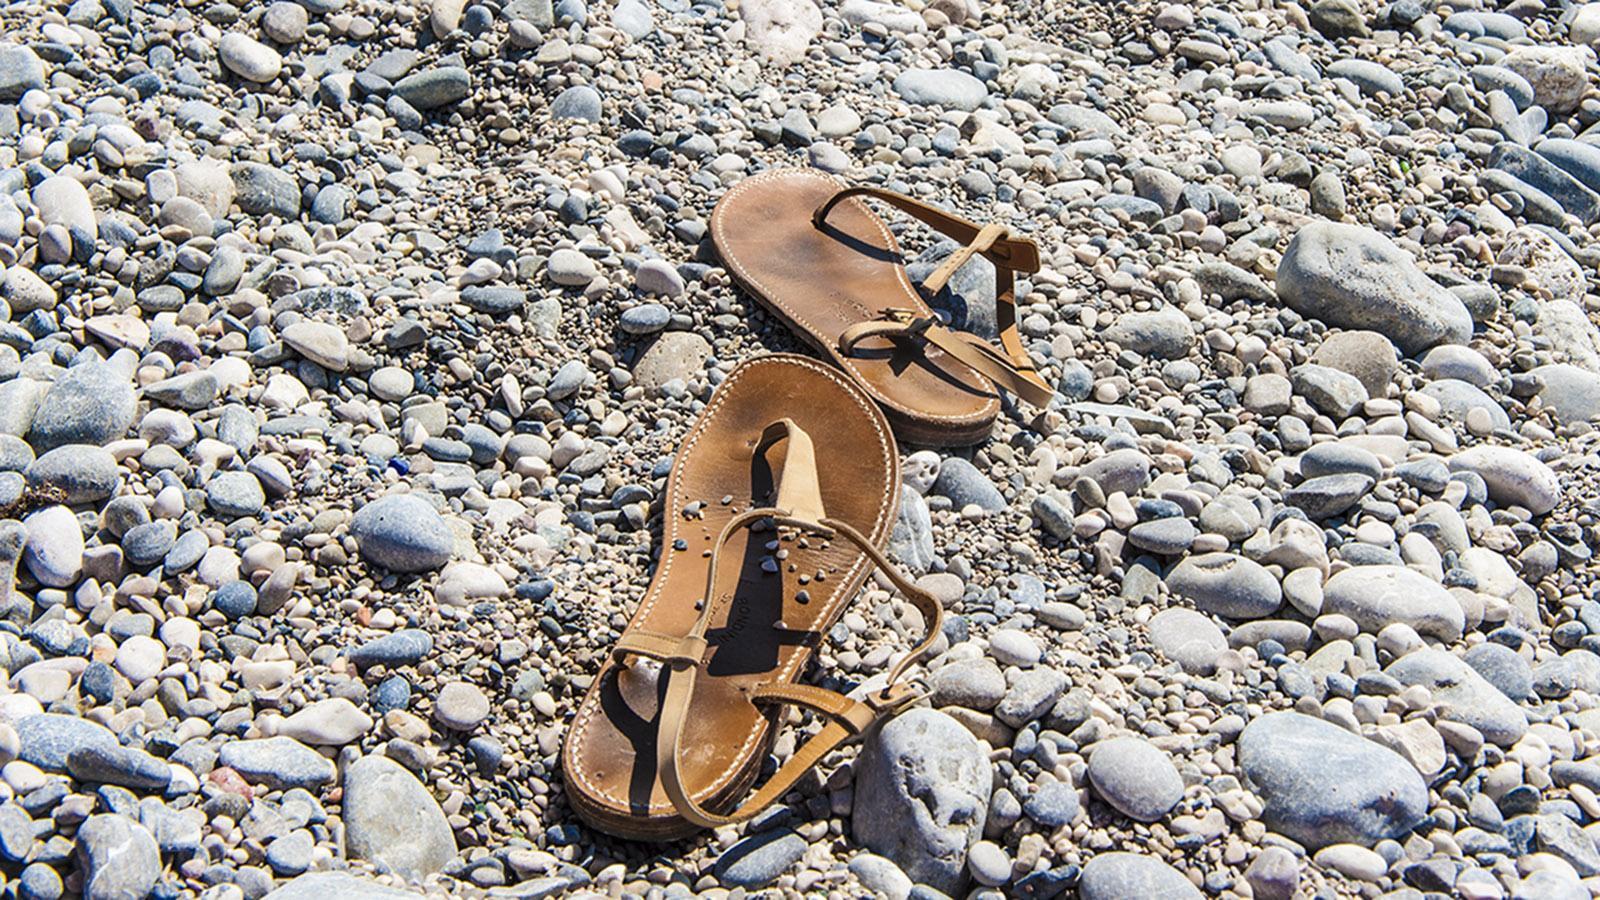 Sandalenklassiker aus Saint-Tropez: die Tropeziannes von Rondini. Foto: Hilke Maunder